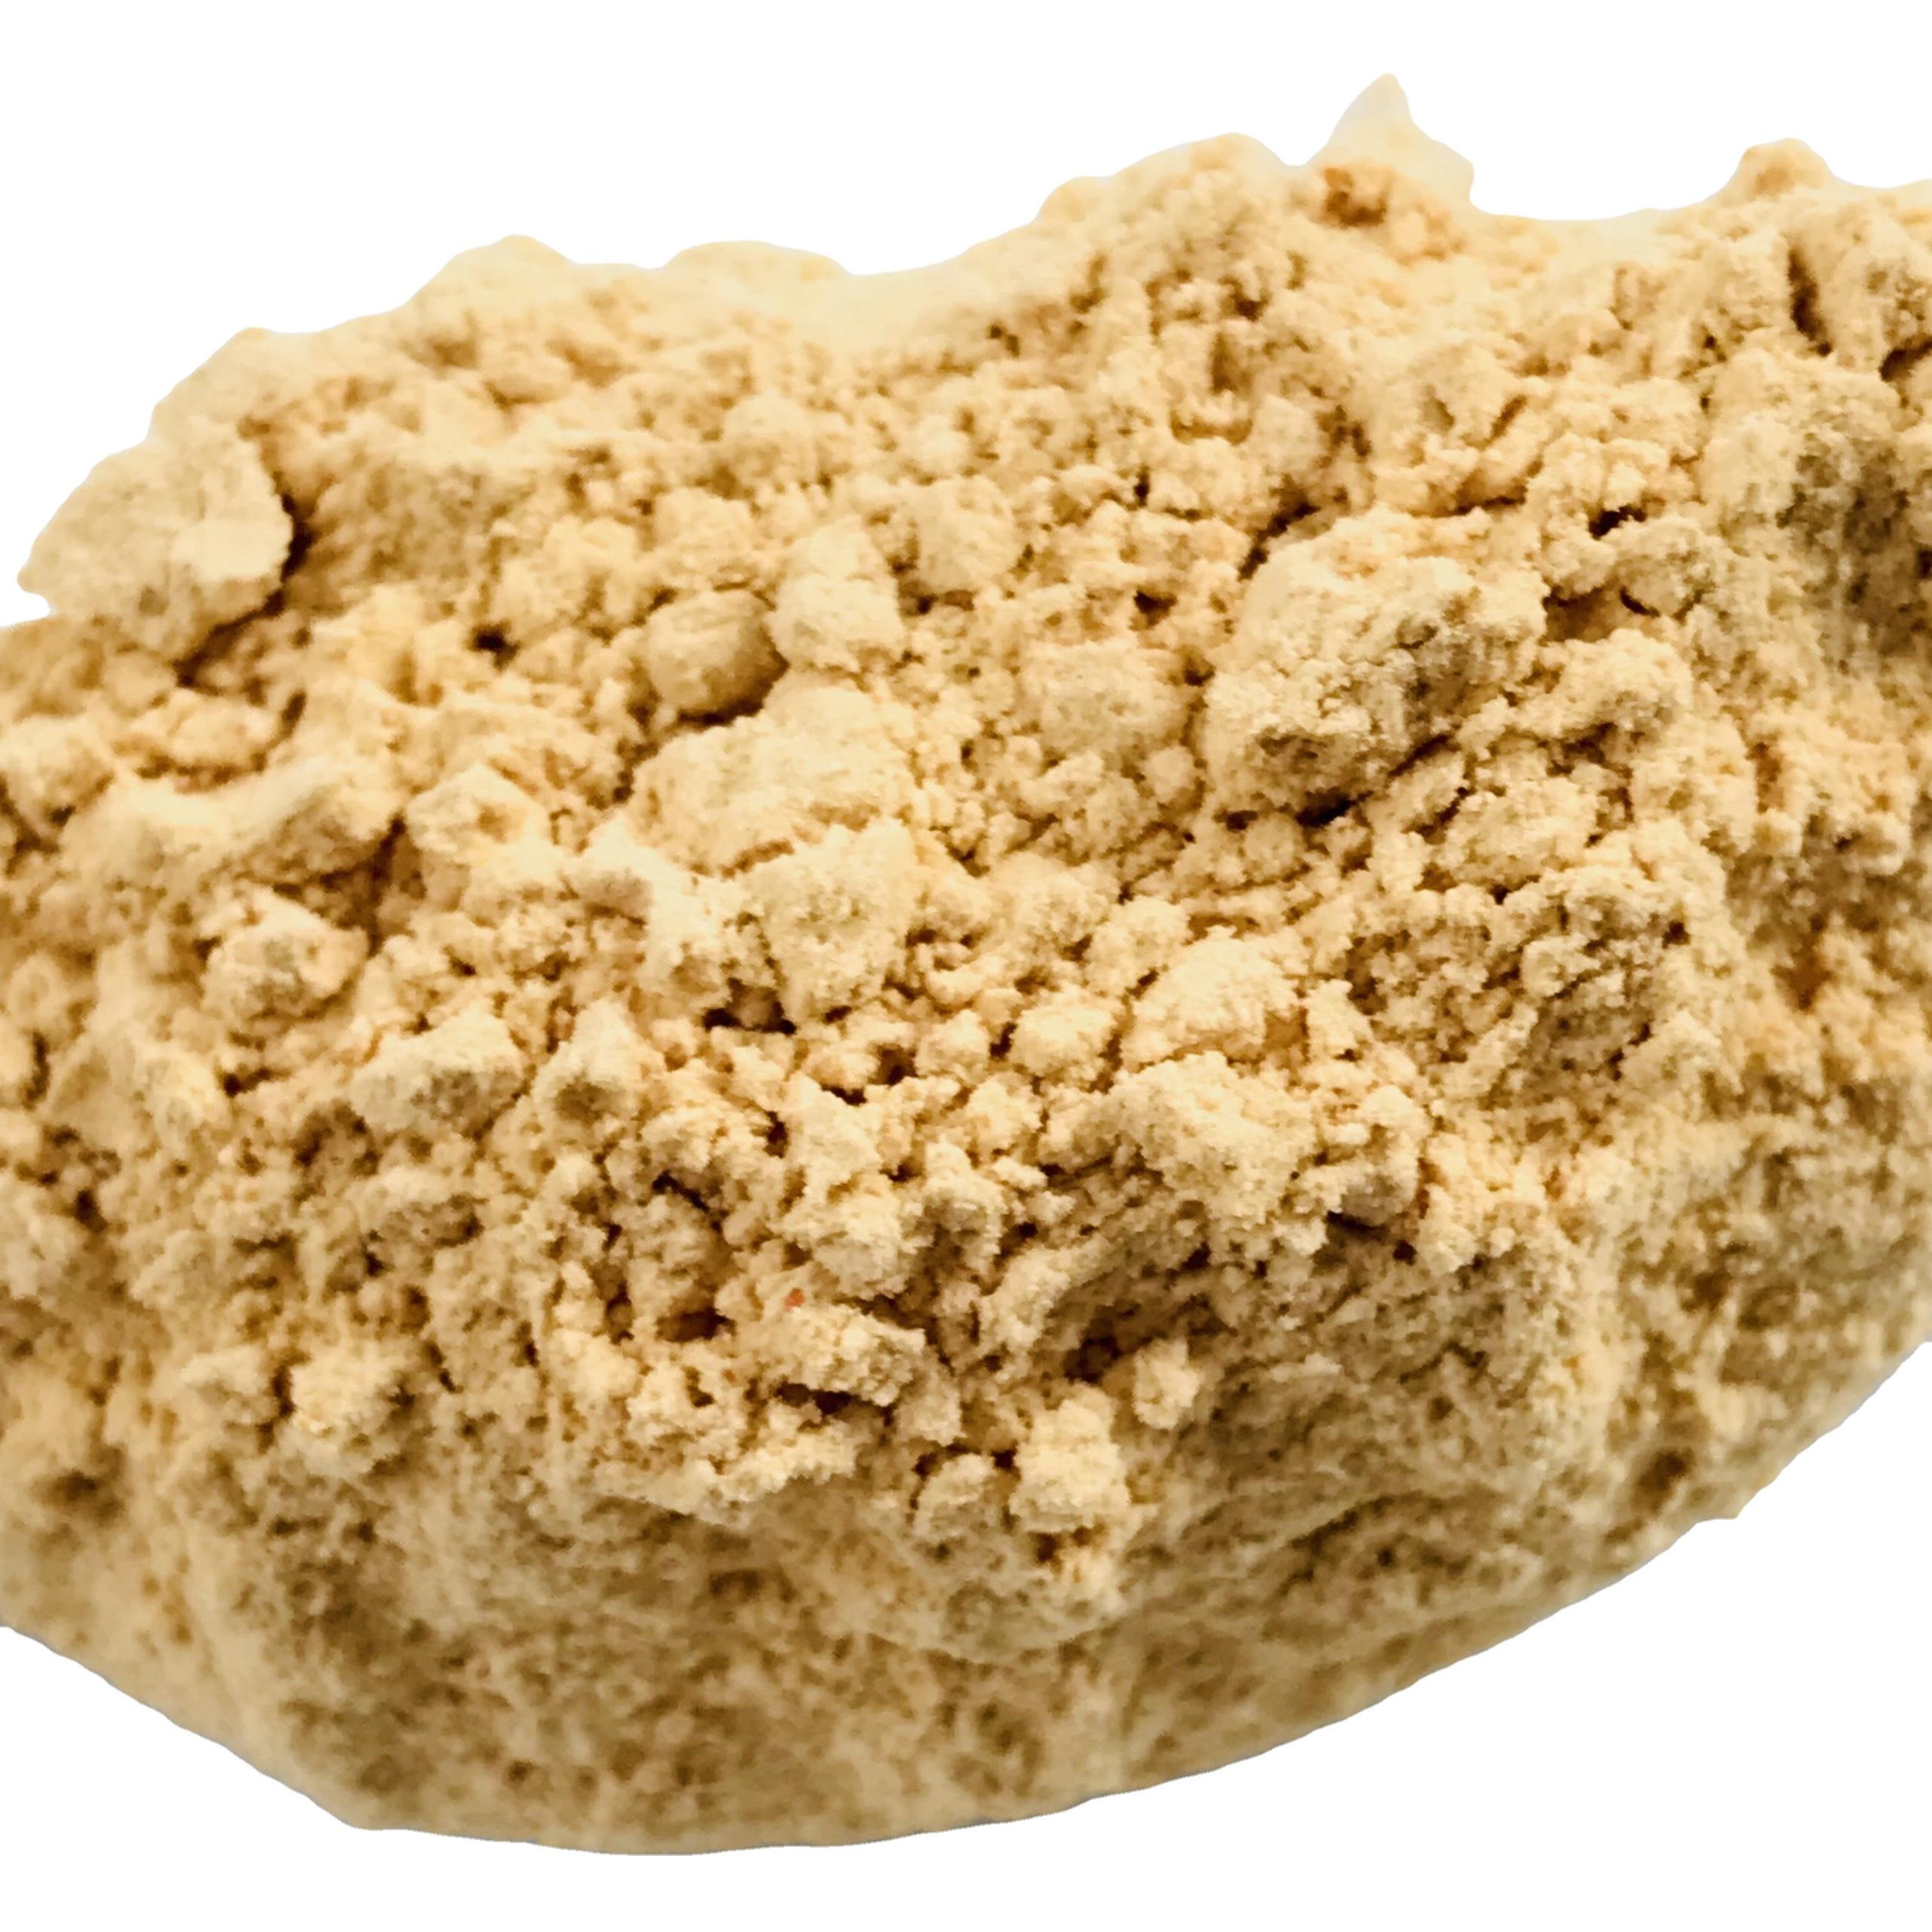 Cordyceps Militaris Mushroom Powder Healthy Product 100% Natural Herbal High Quality Product Good For Health Providing Energy